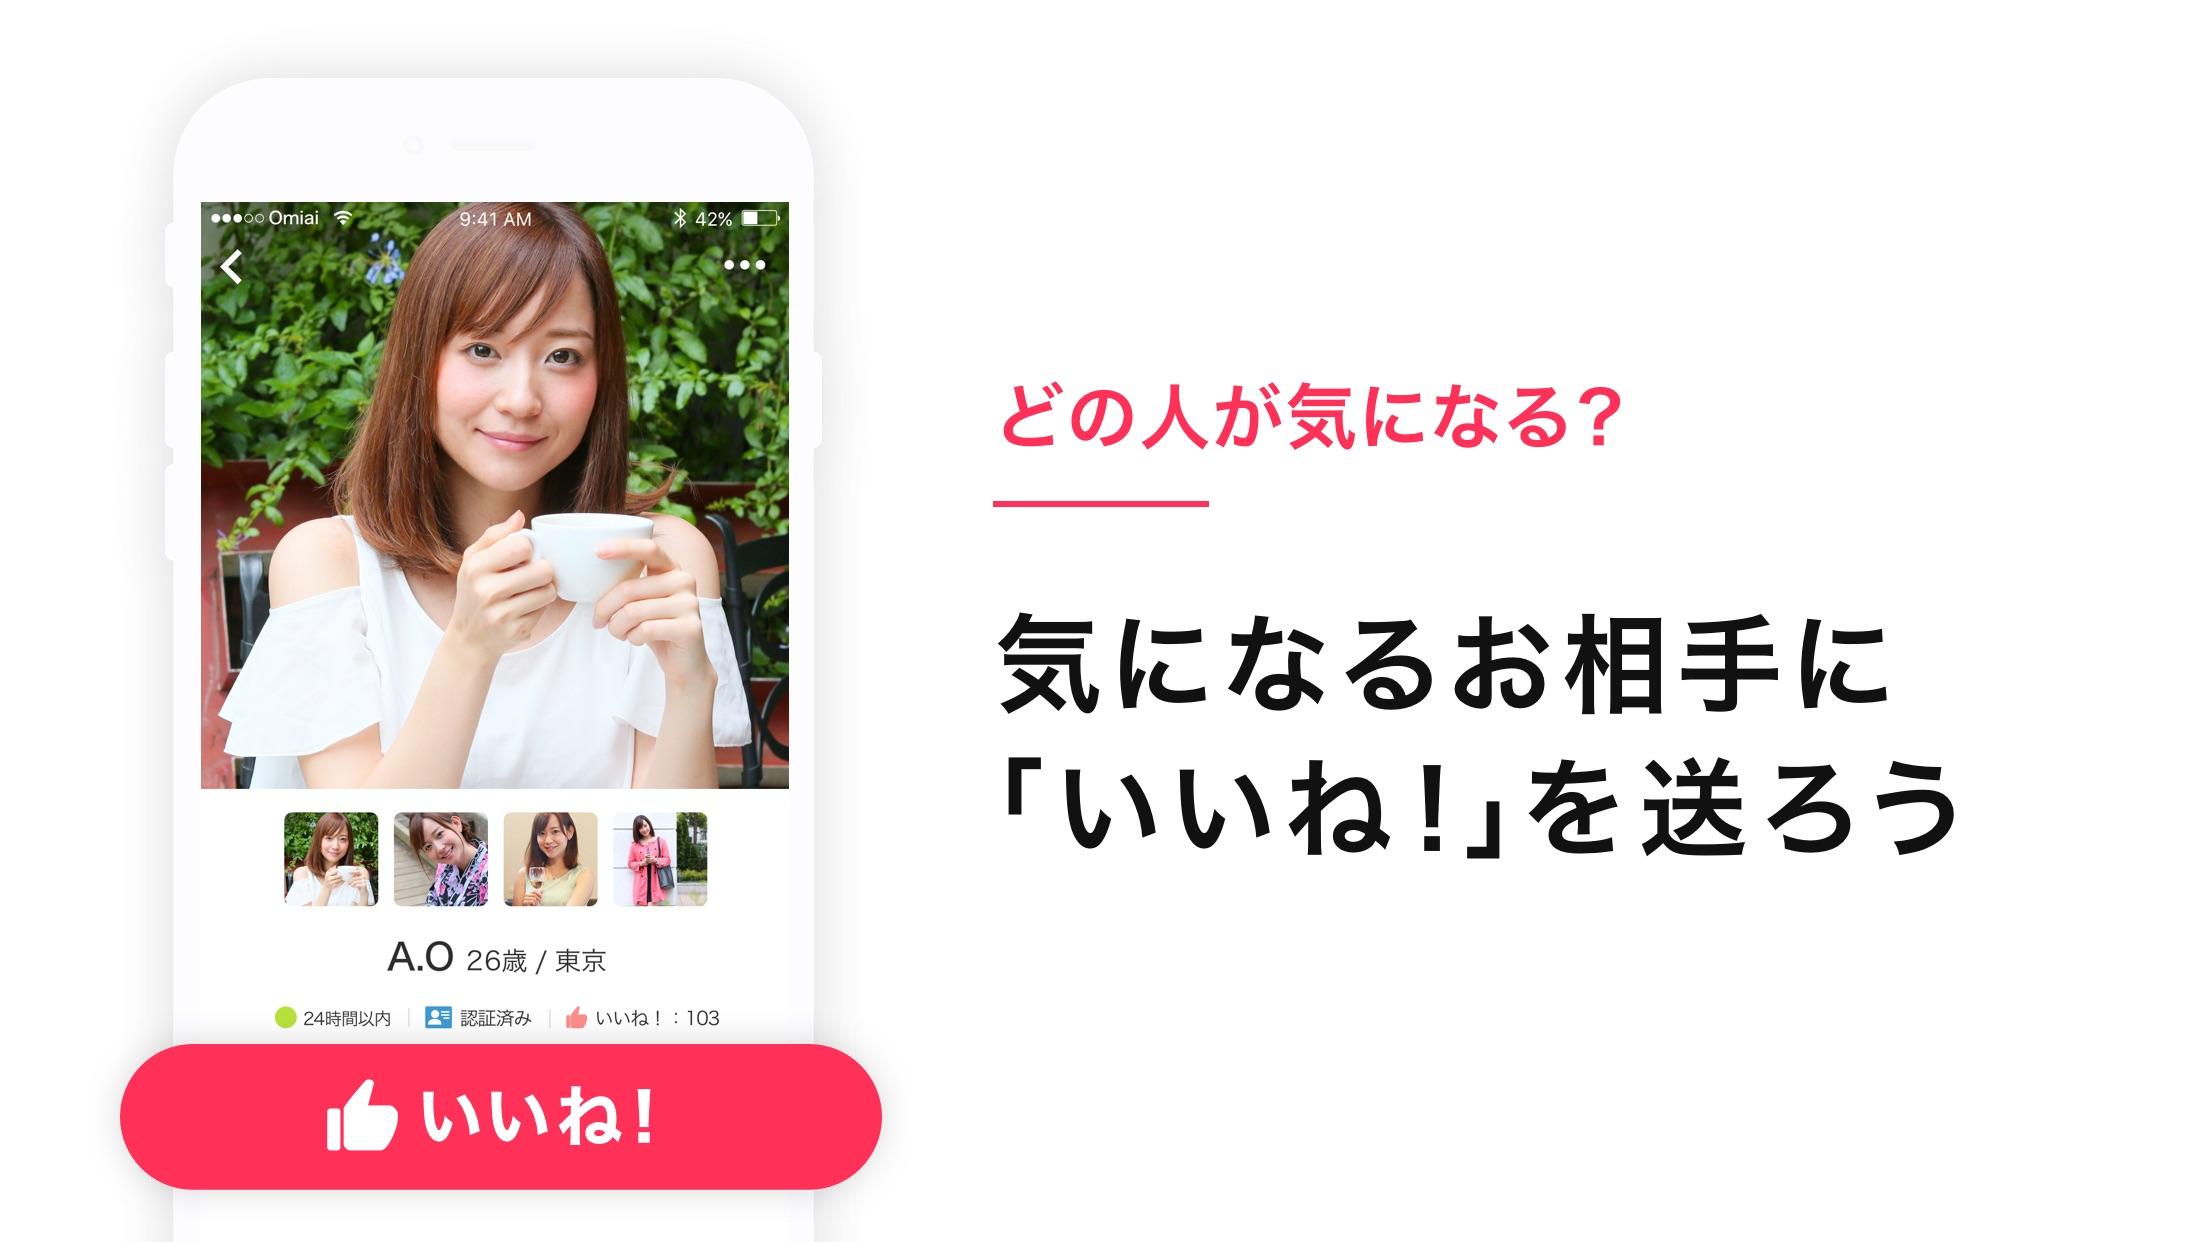 Omiai-恋活・婚活マッチングアプリ Screenshot